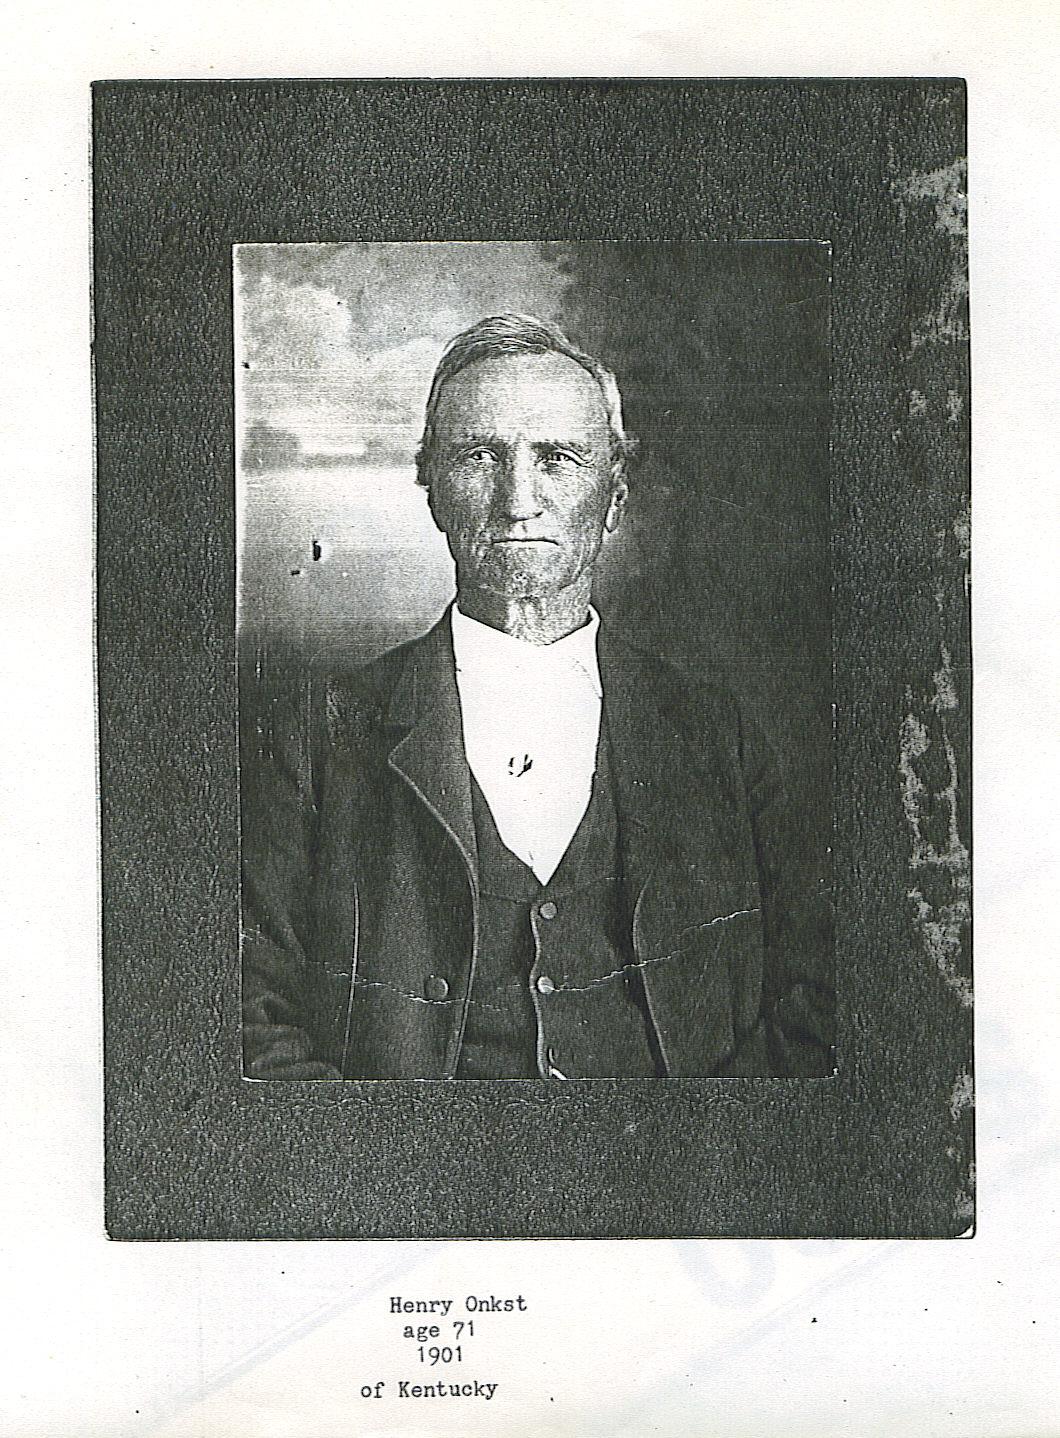 Henry Onkst